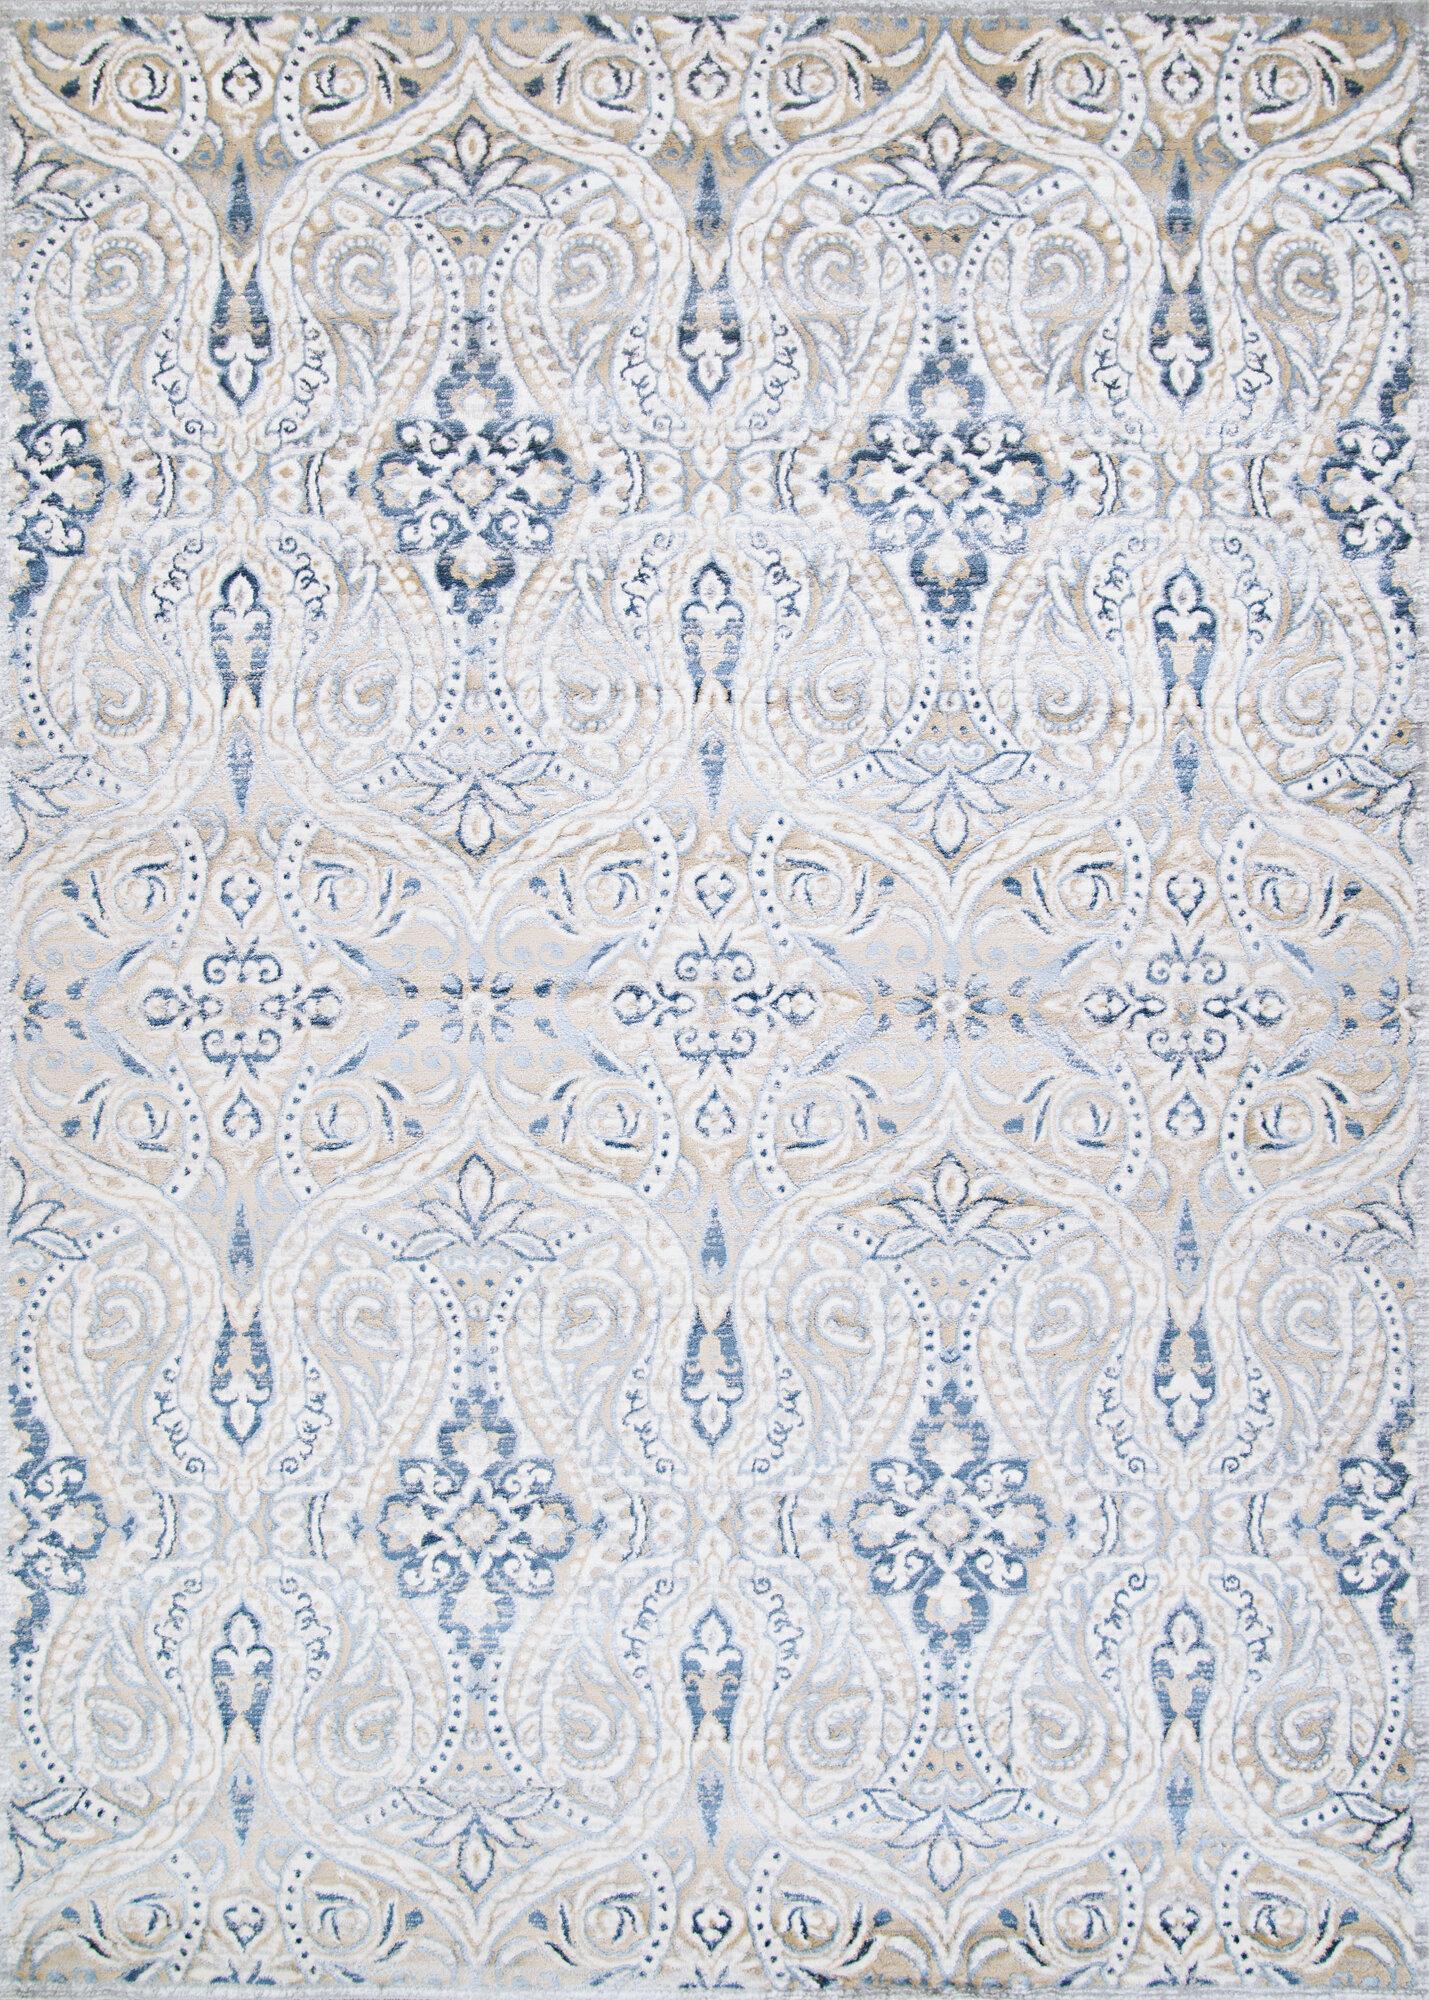 Charlton Home Karmane Floral Blue Gray Area Rug Reviews Wayfair